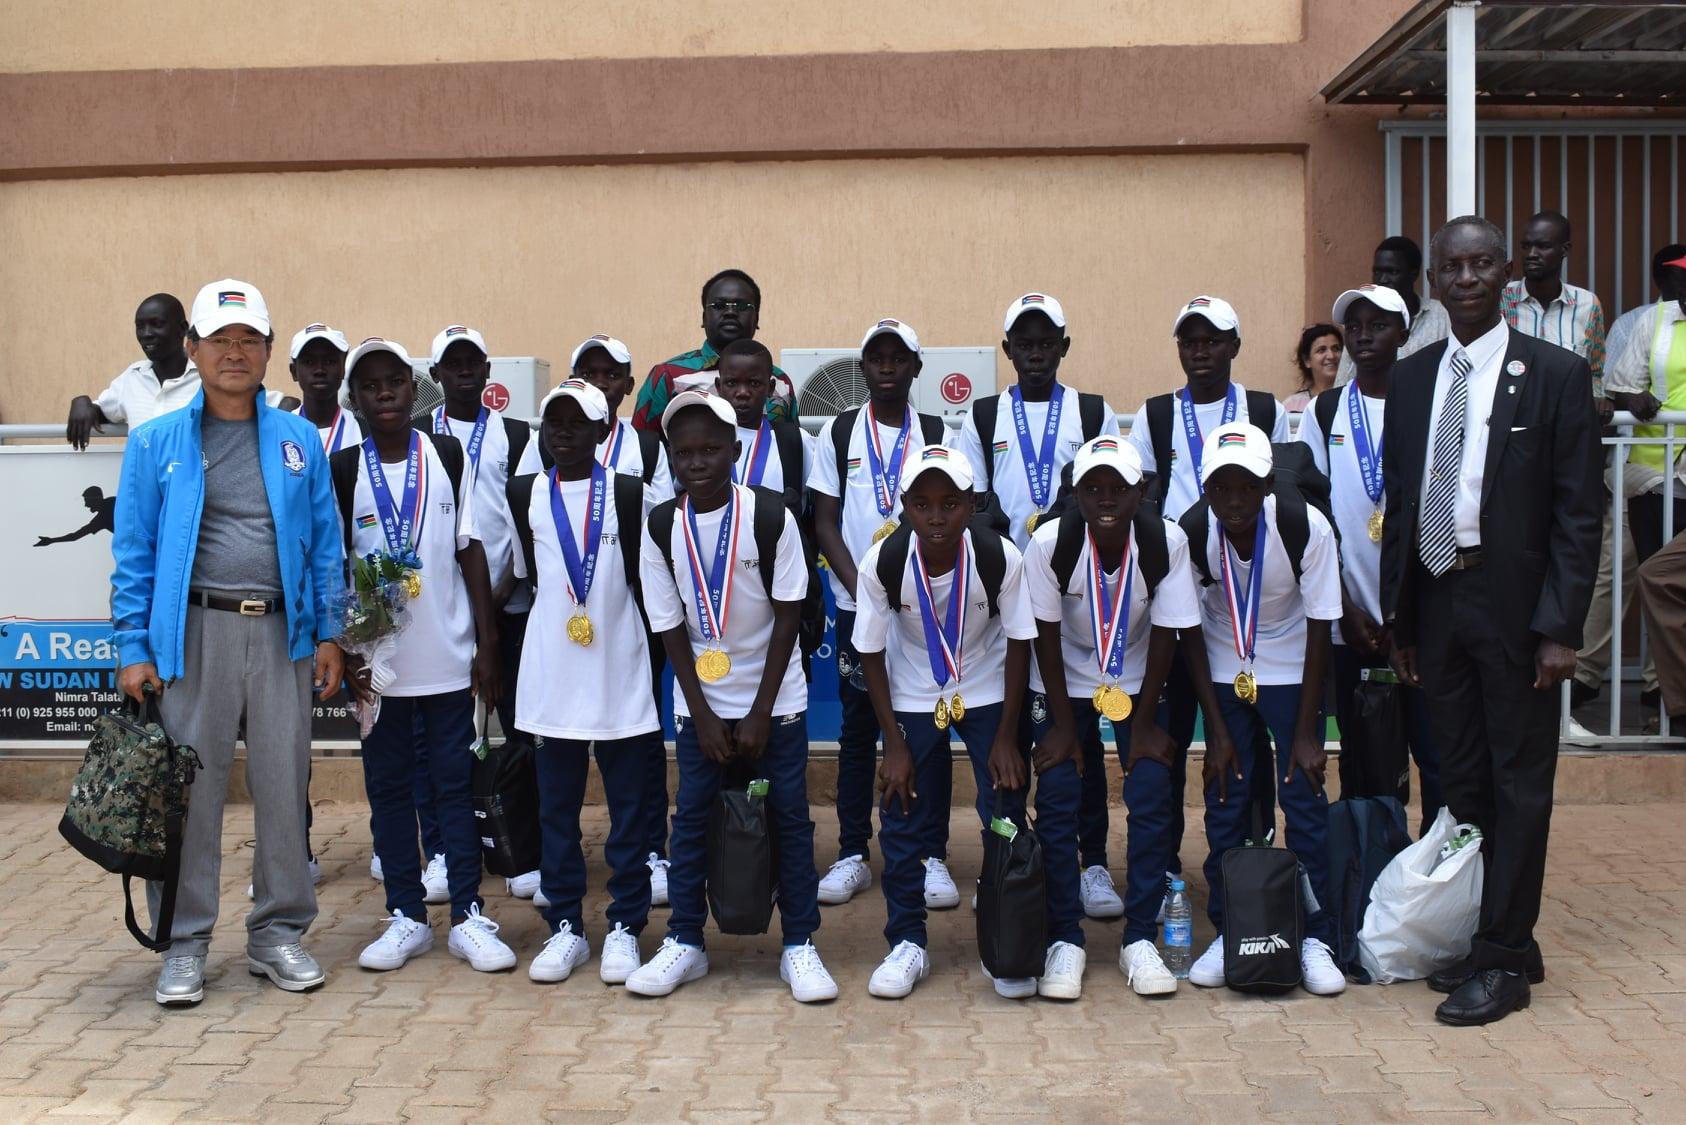 Victorious U12 team returns home